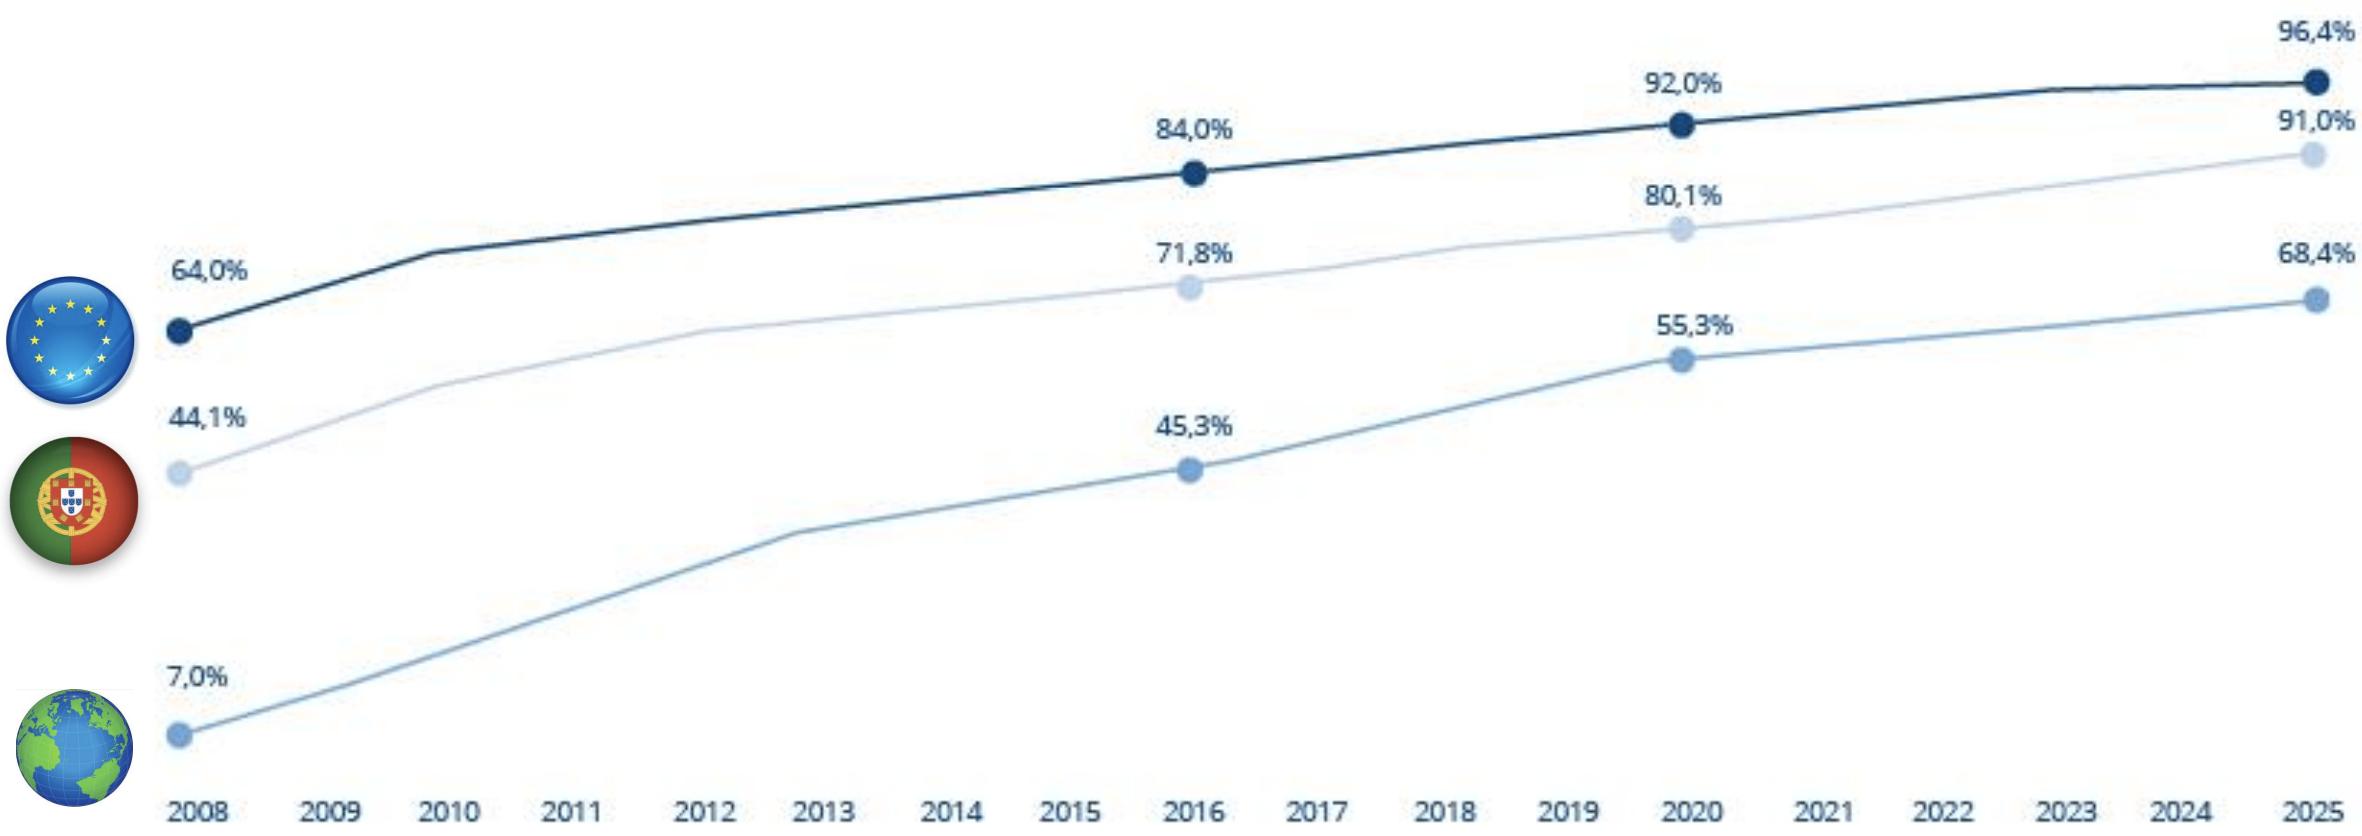 % de utilizadores de internet